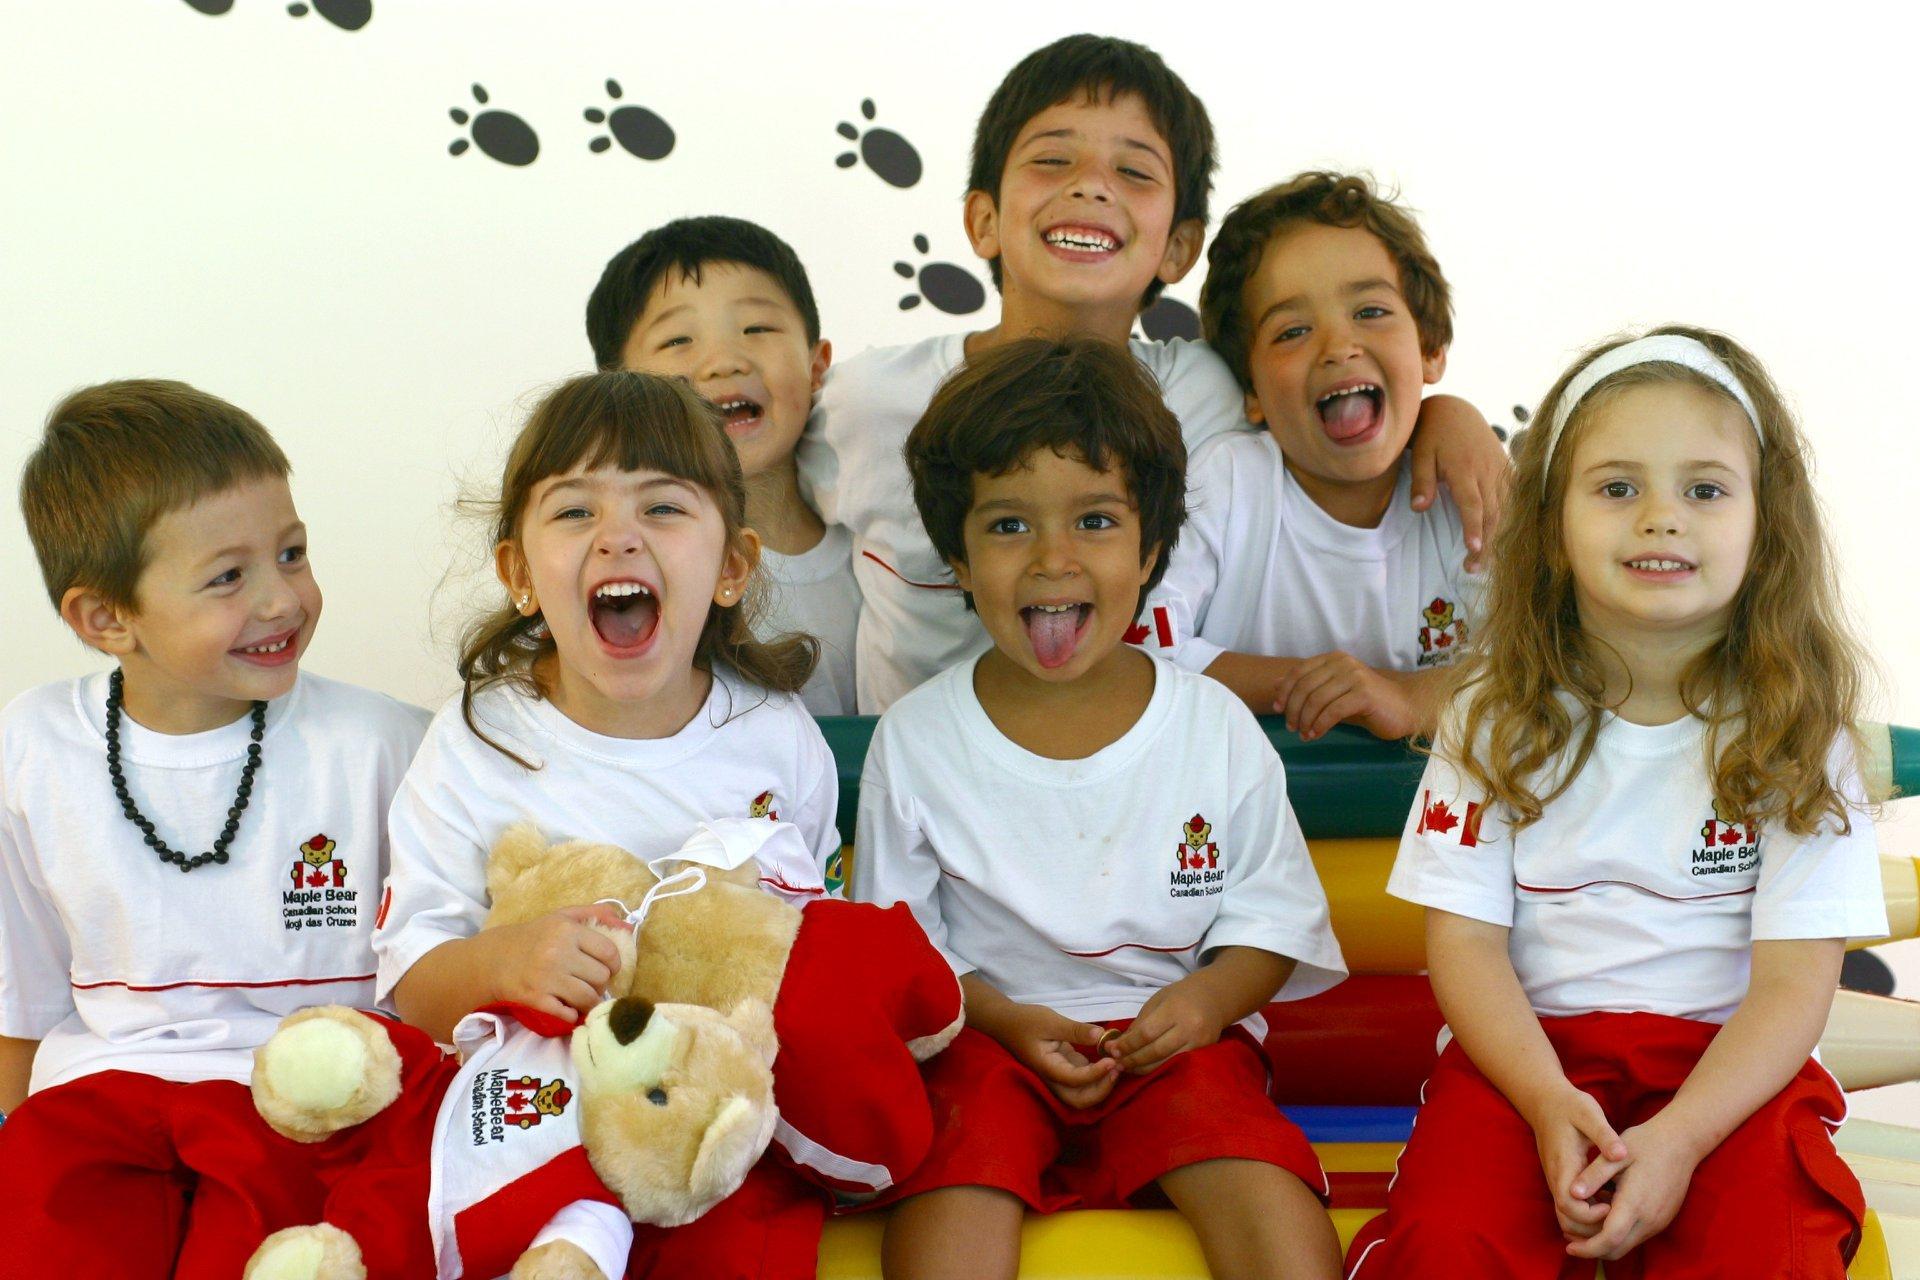 Trường mầm non Canada Maple Bear - Văn Cao, Đằng Giang